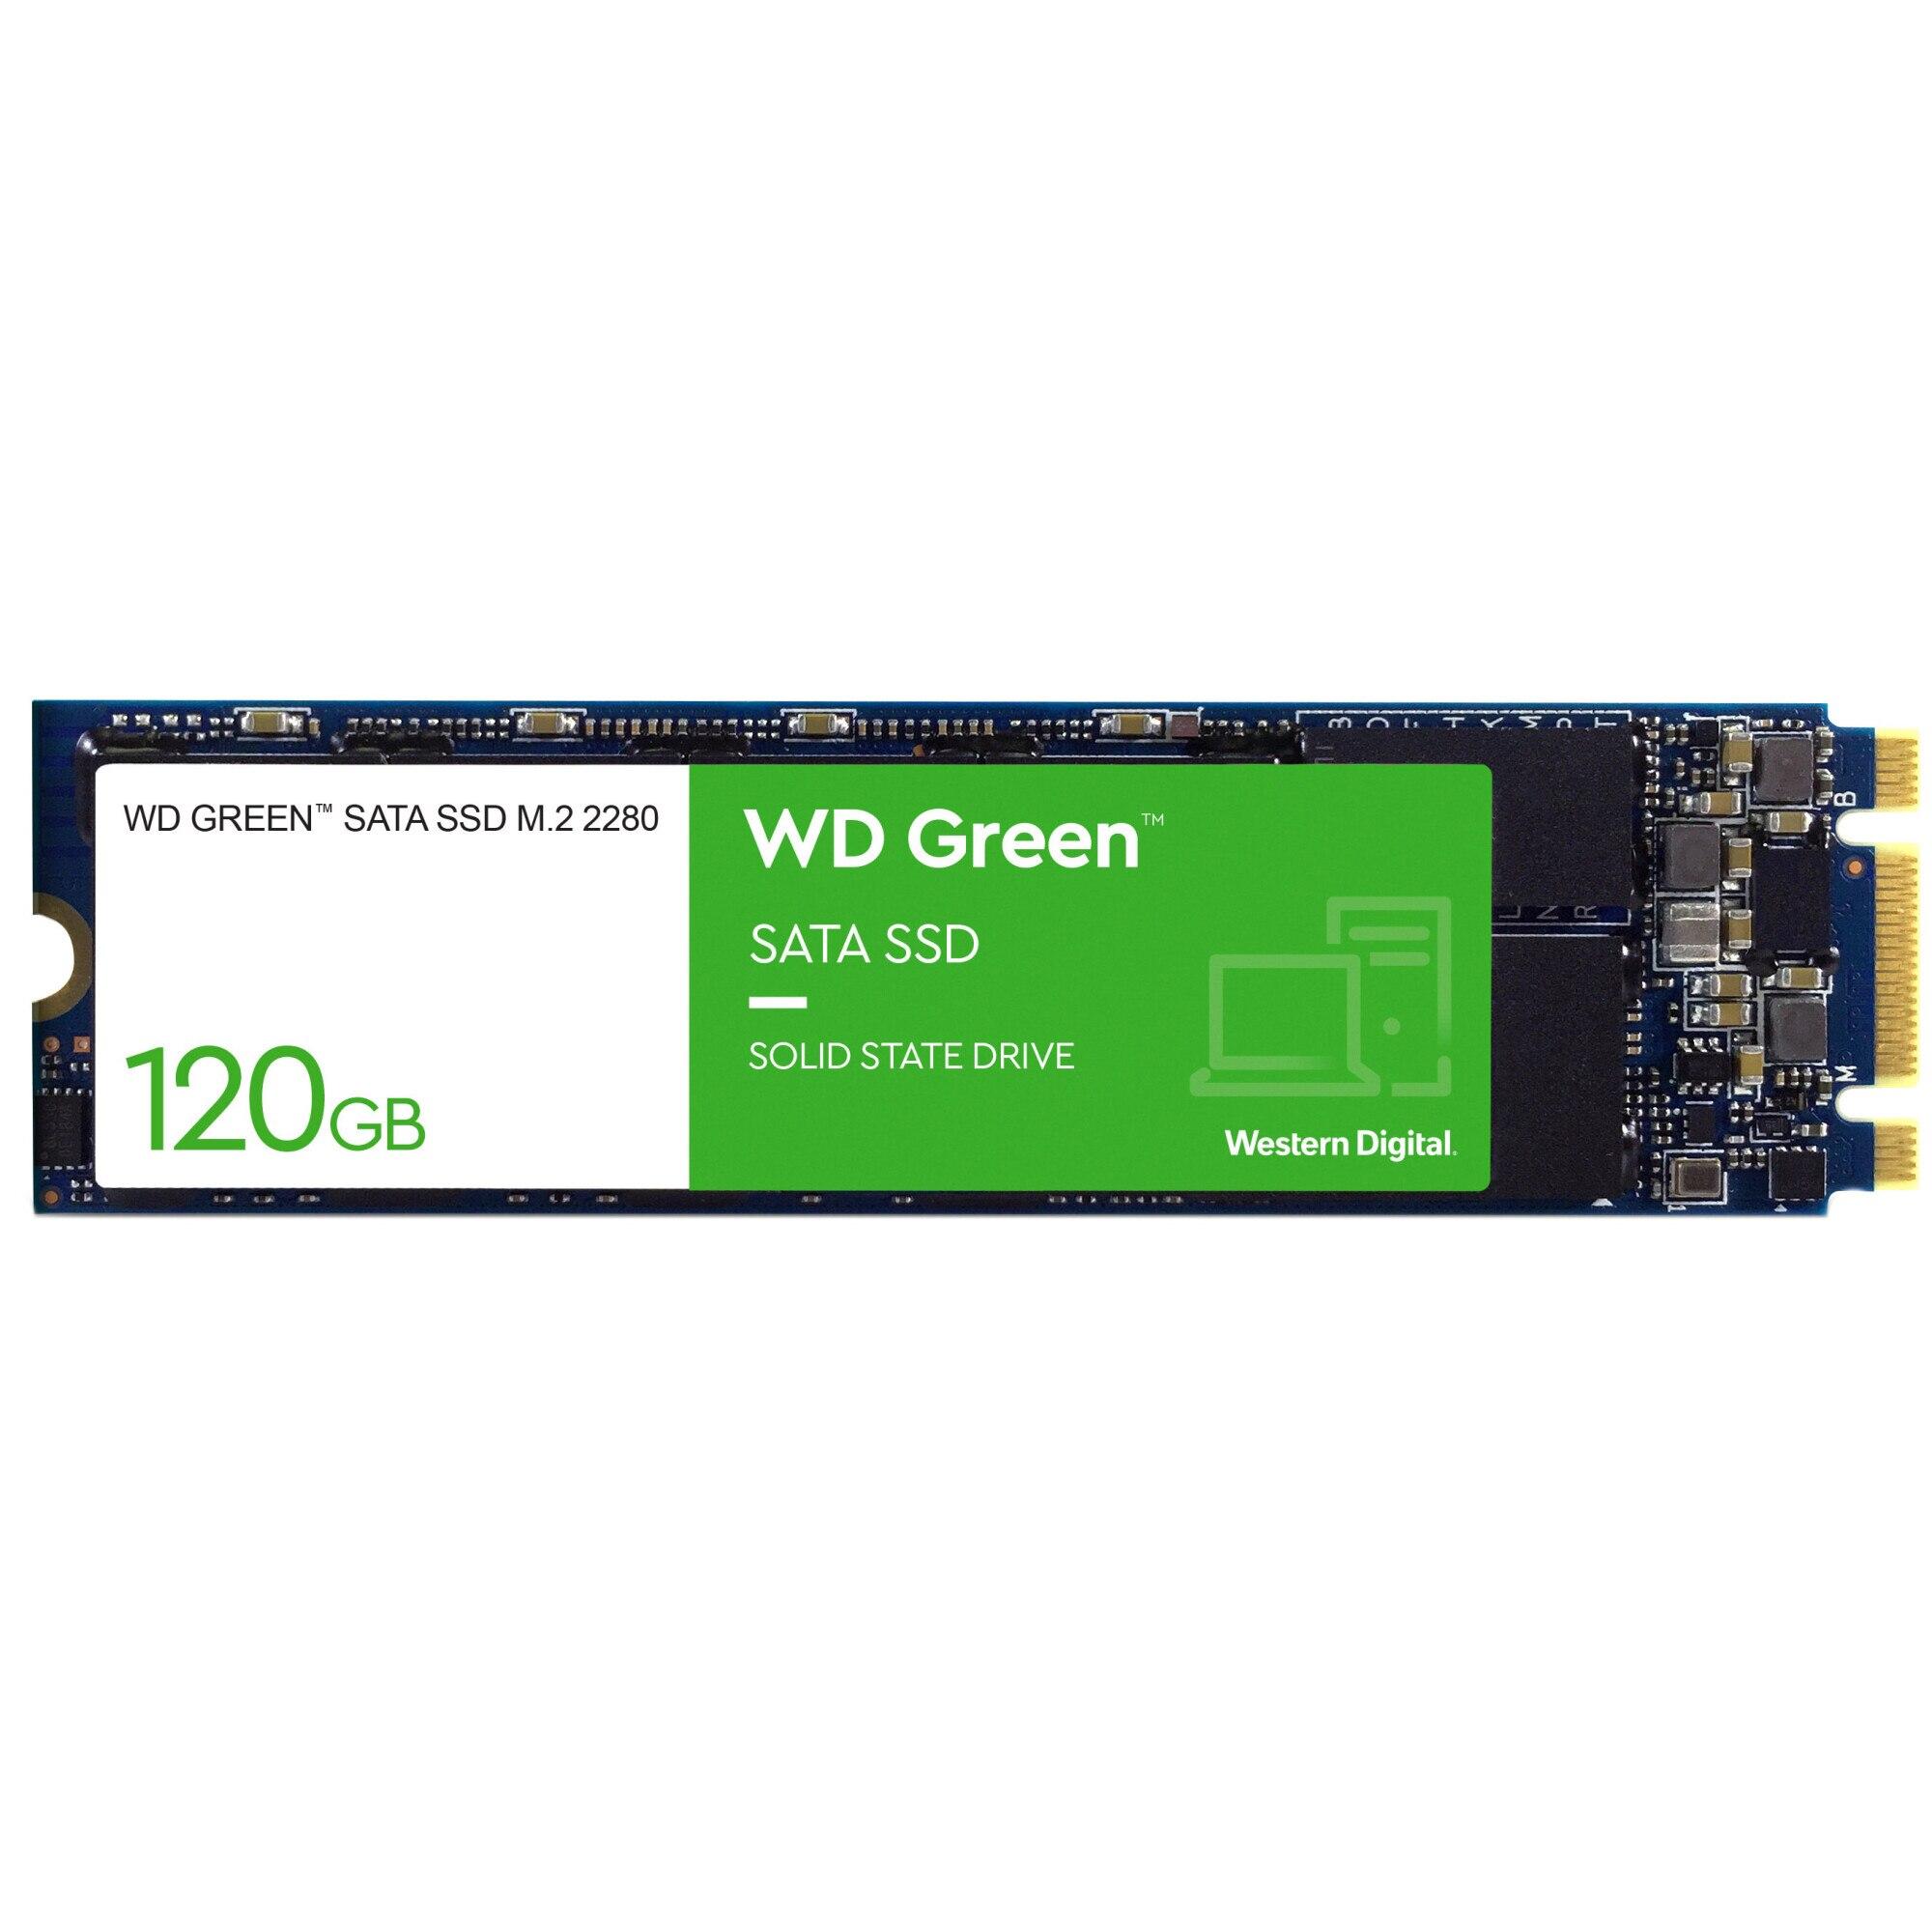 Fotografie Solid-state drive (SSD) WD, 120GB, Green, SATA3, M.2 2280